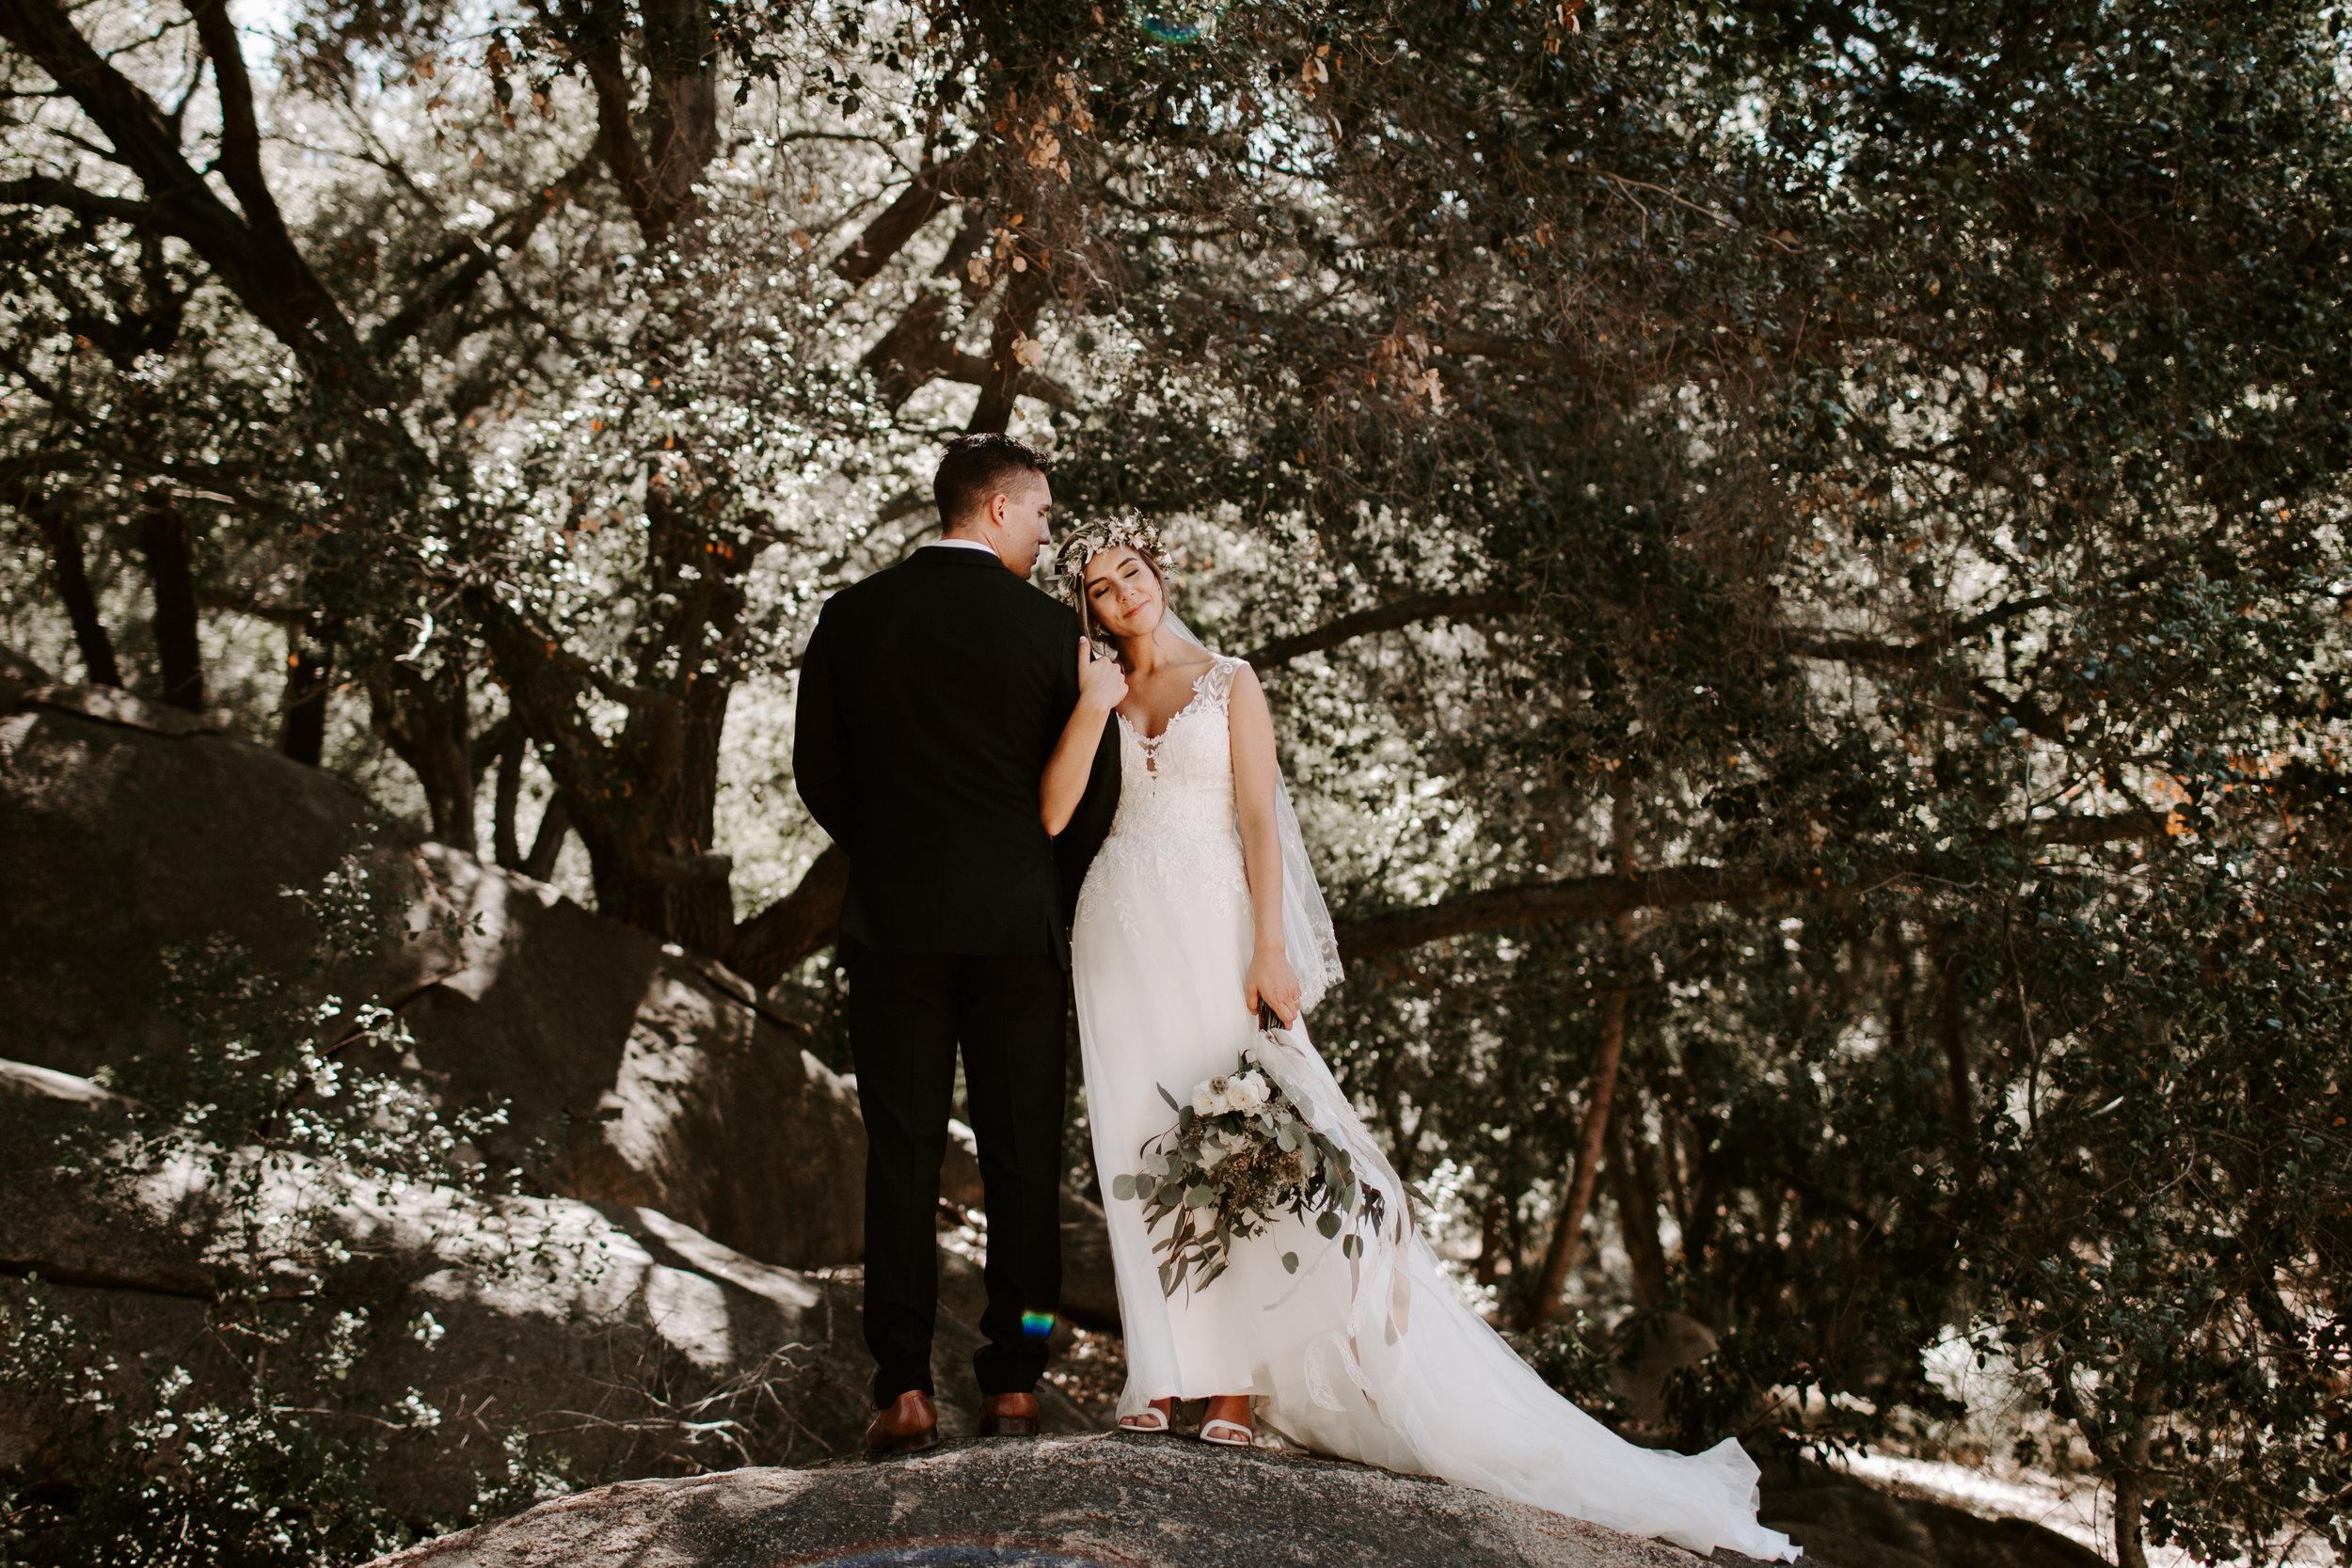 kate+zack_wedding_secludedgardenestate_temecula_madisonrylee_0650.jpg